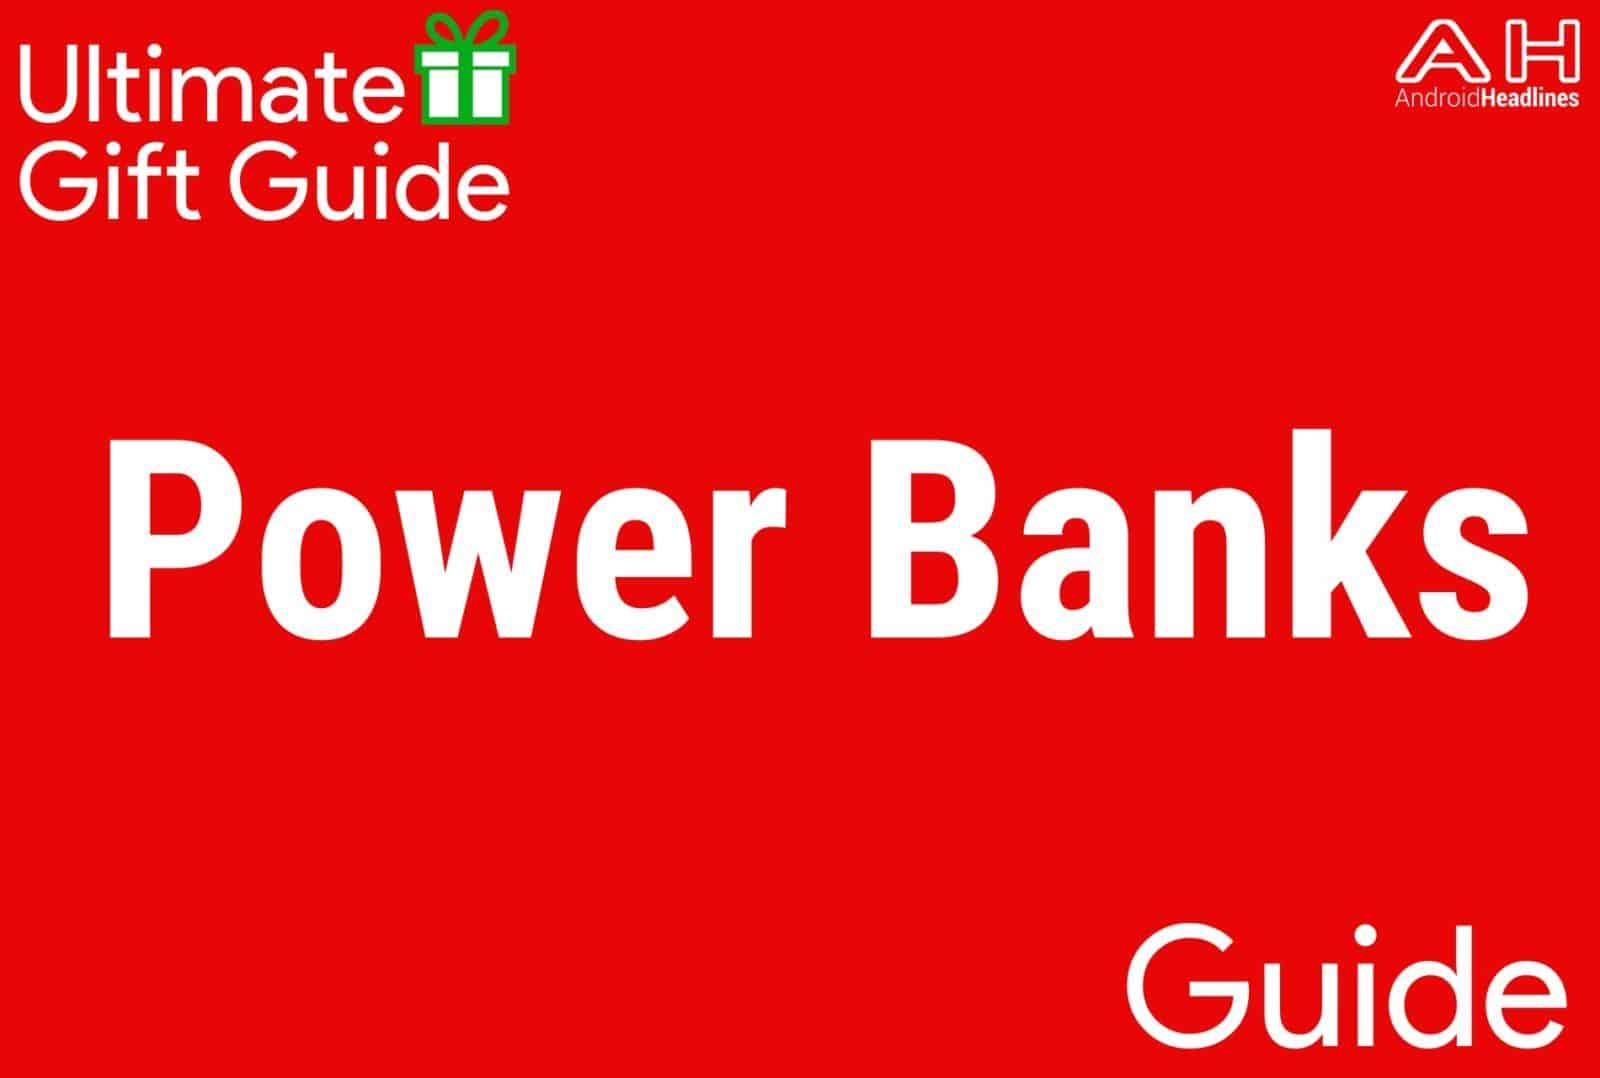 External Power Banks - Gift Guide 2015